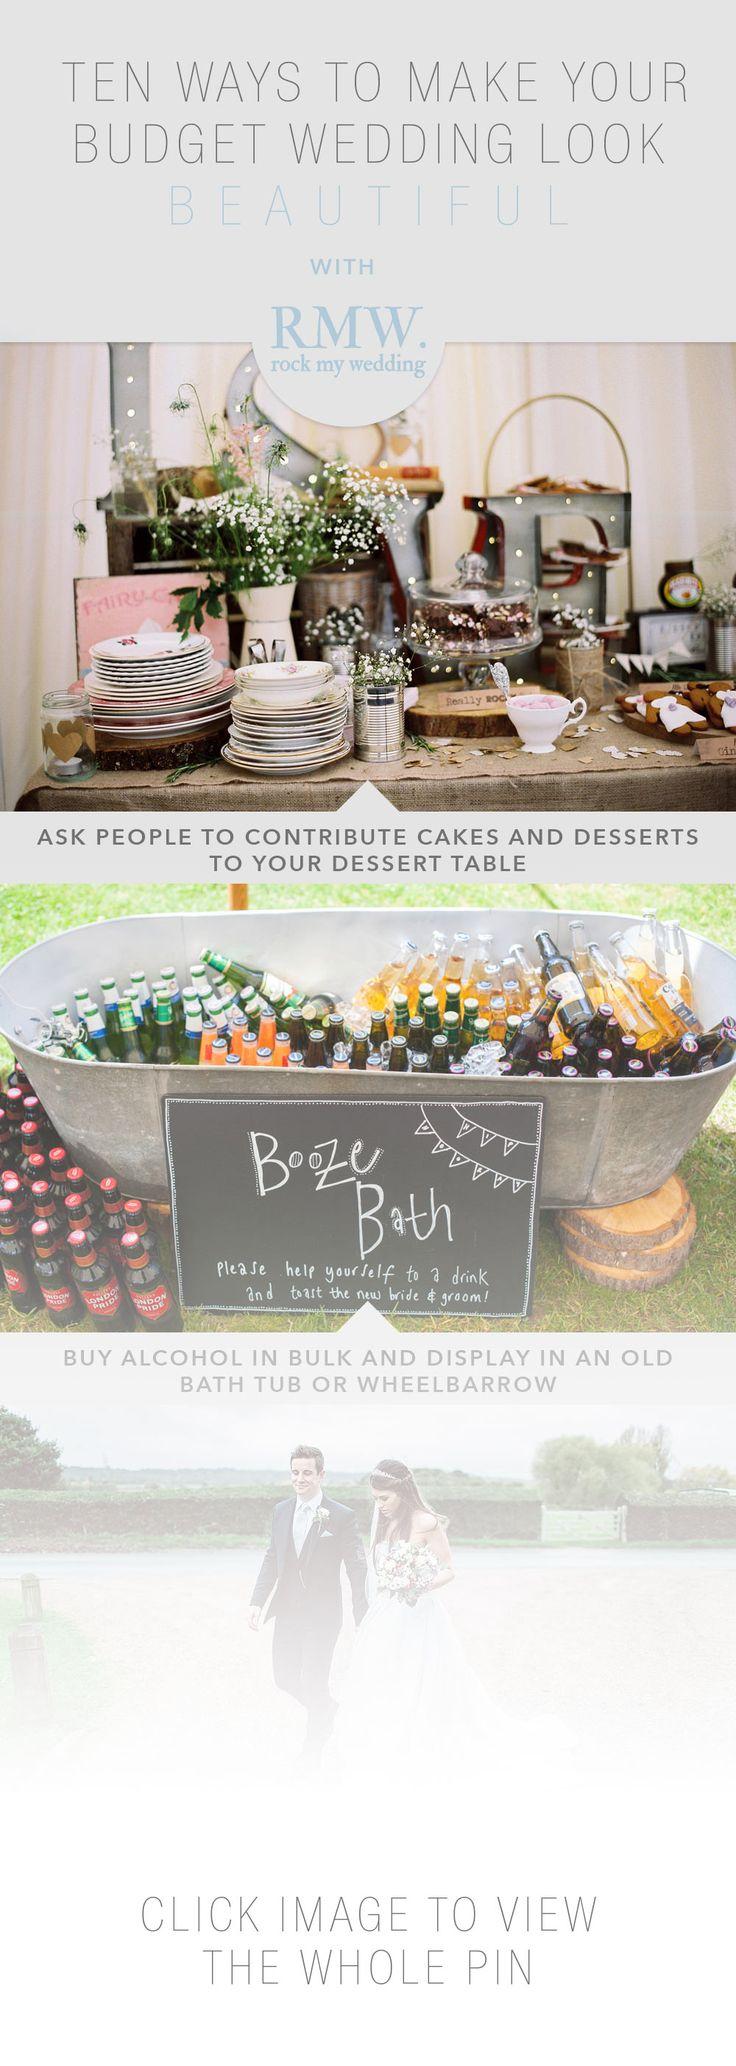 10 ways to make your budget wedding